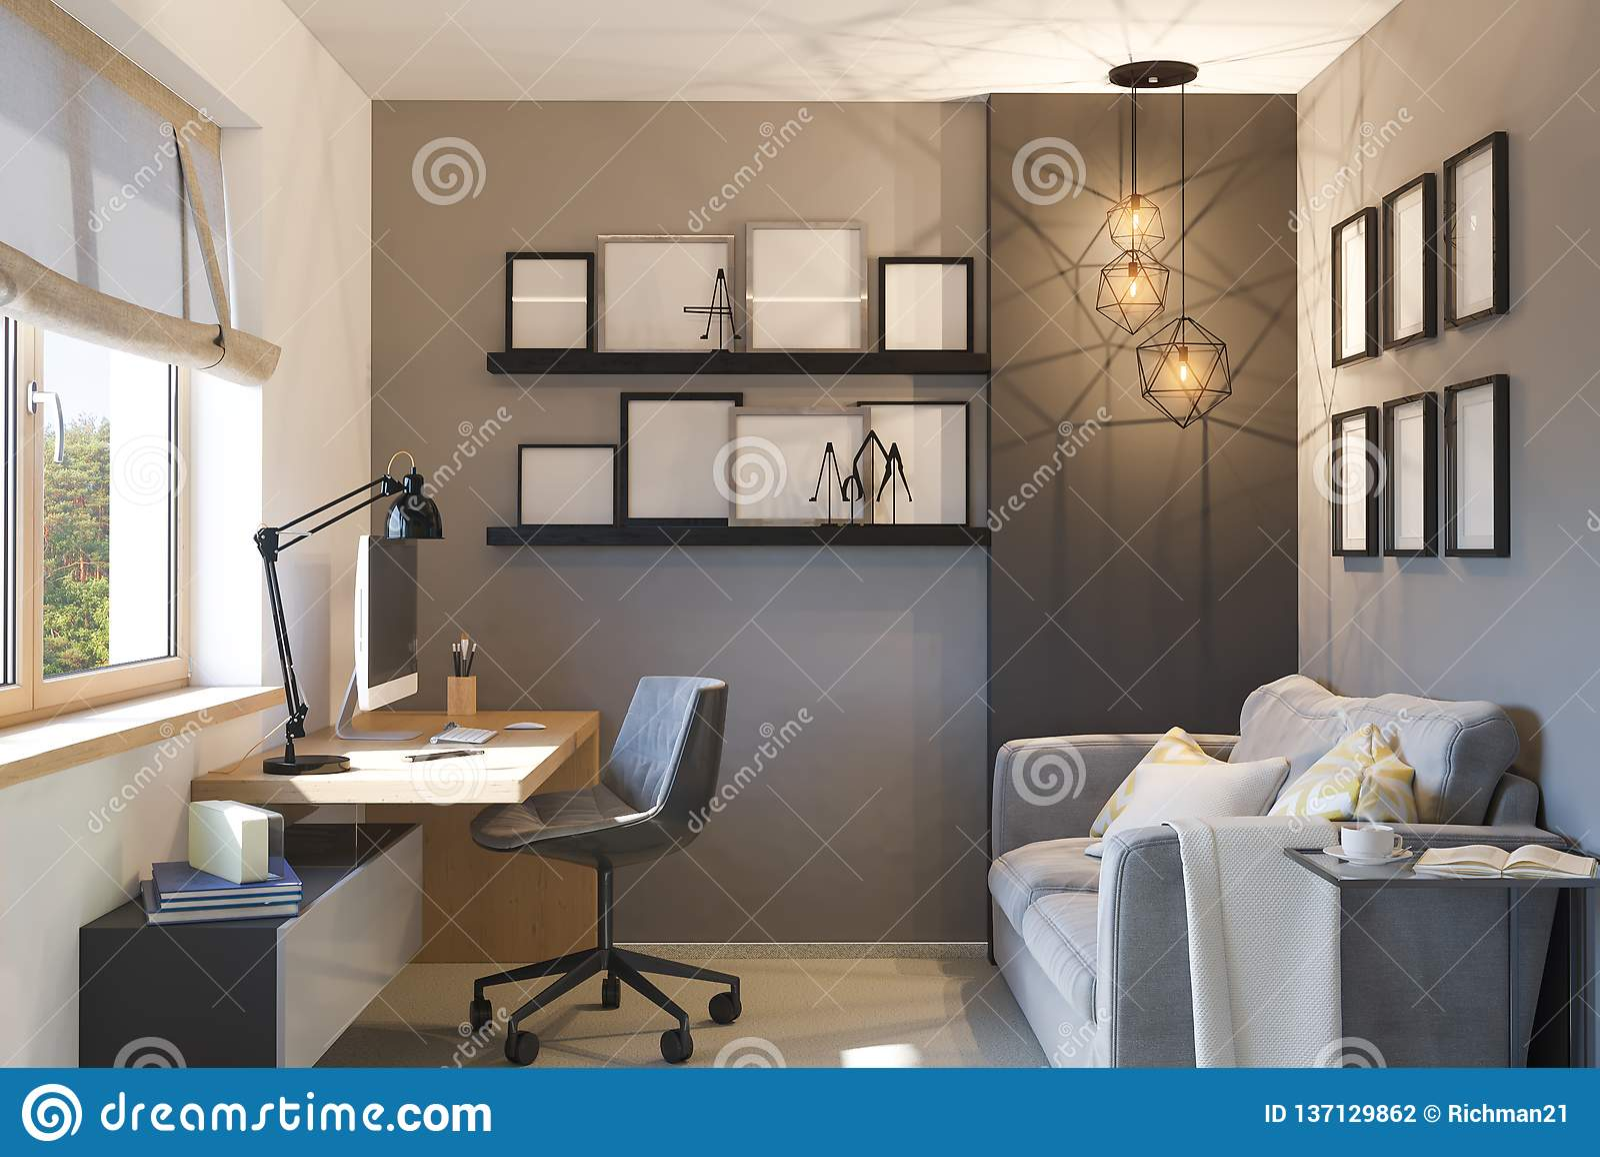 3d Illustration Of Interior Design Concept For Home Office